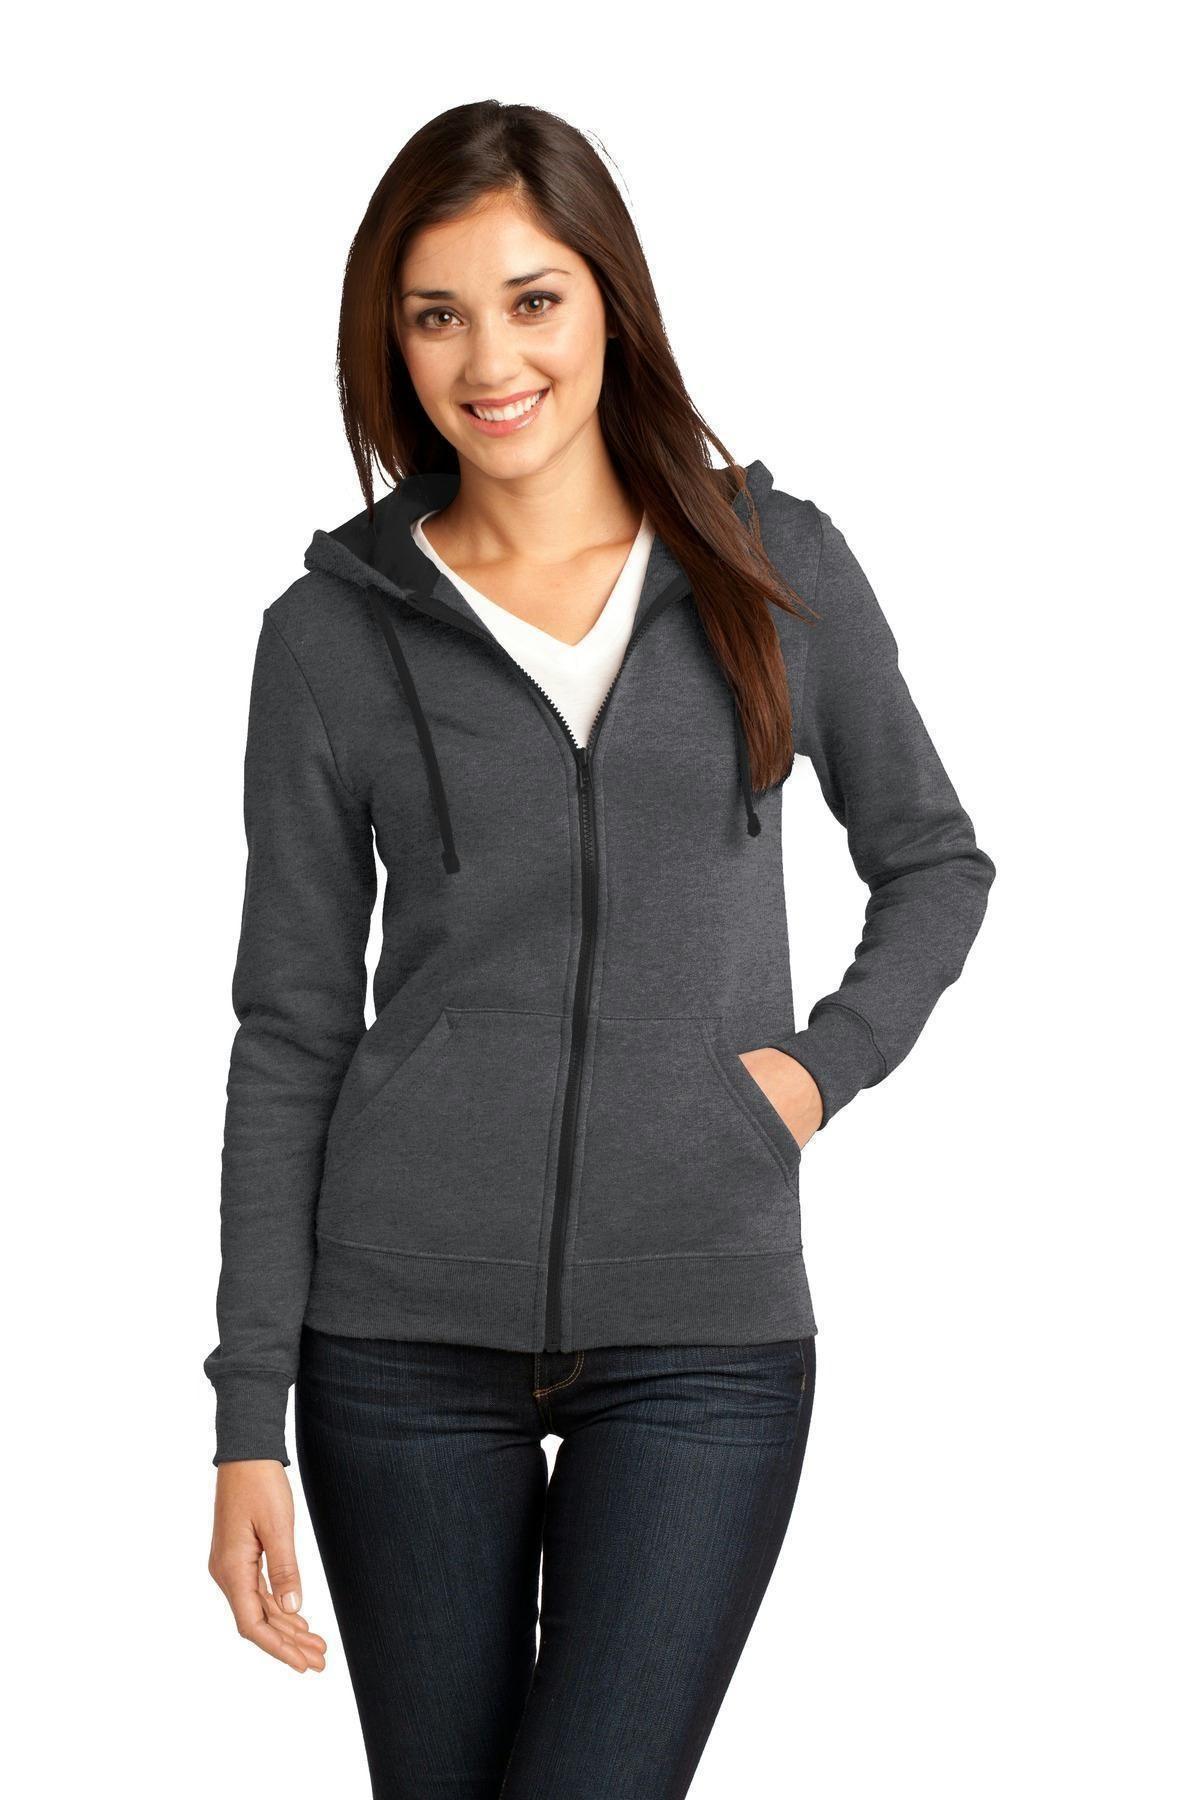 ANVIL Ladies Fashion Full Zip HOODED SWEATSHIRT Hoody in 9 Colour Choices